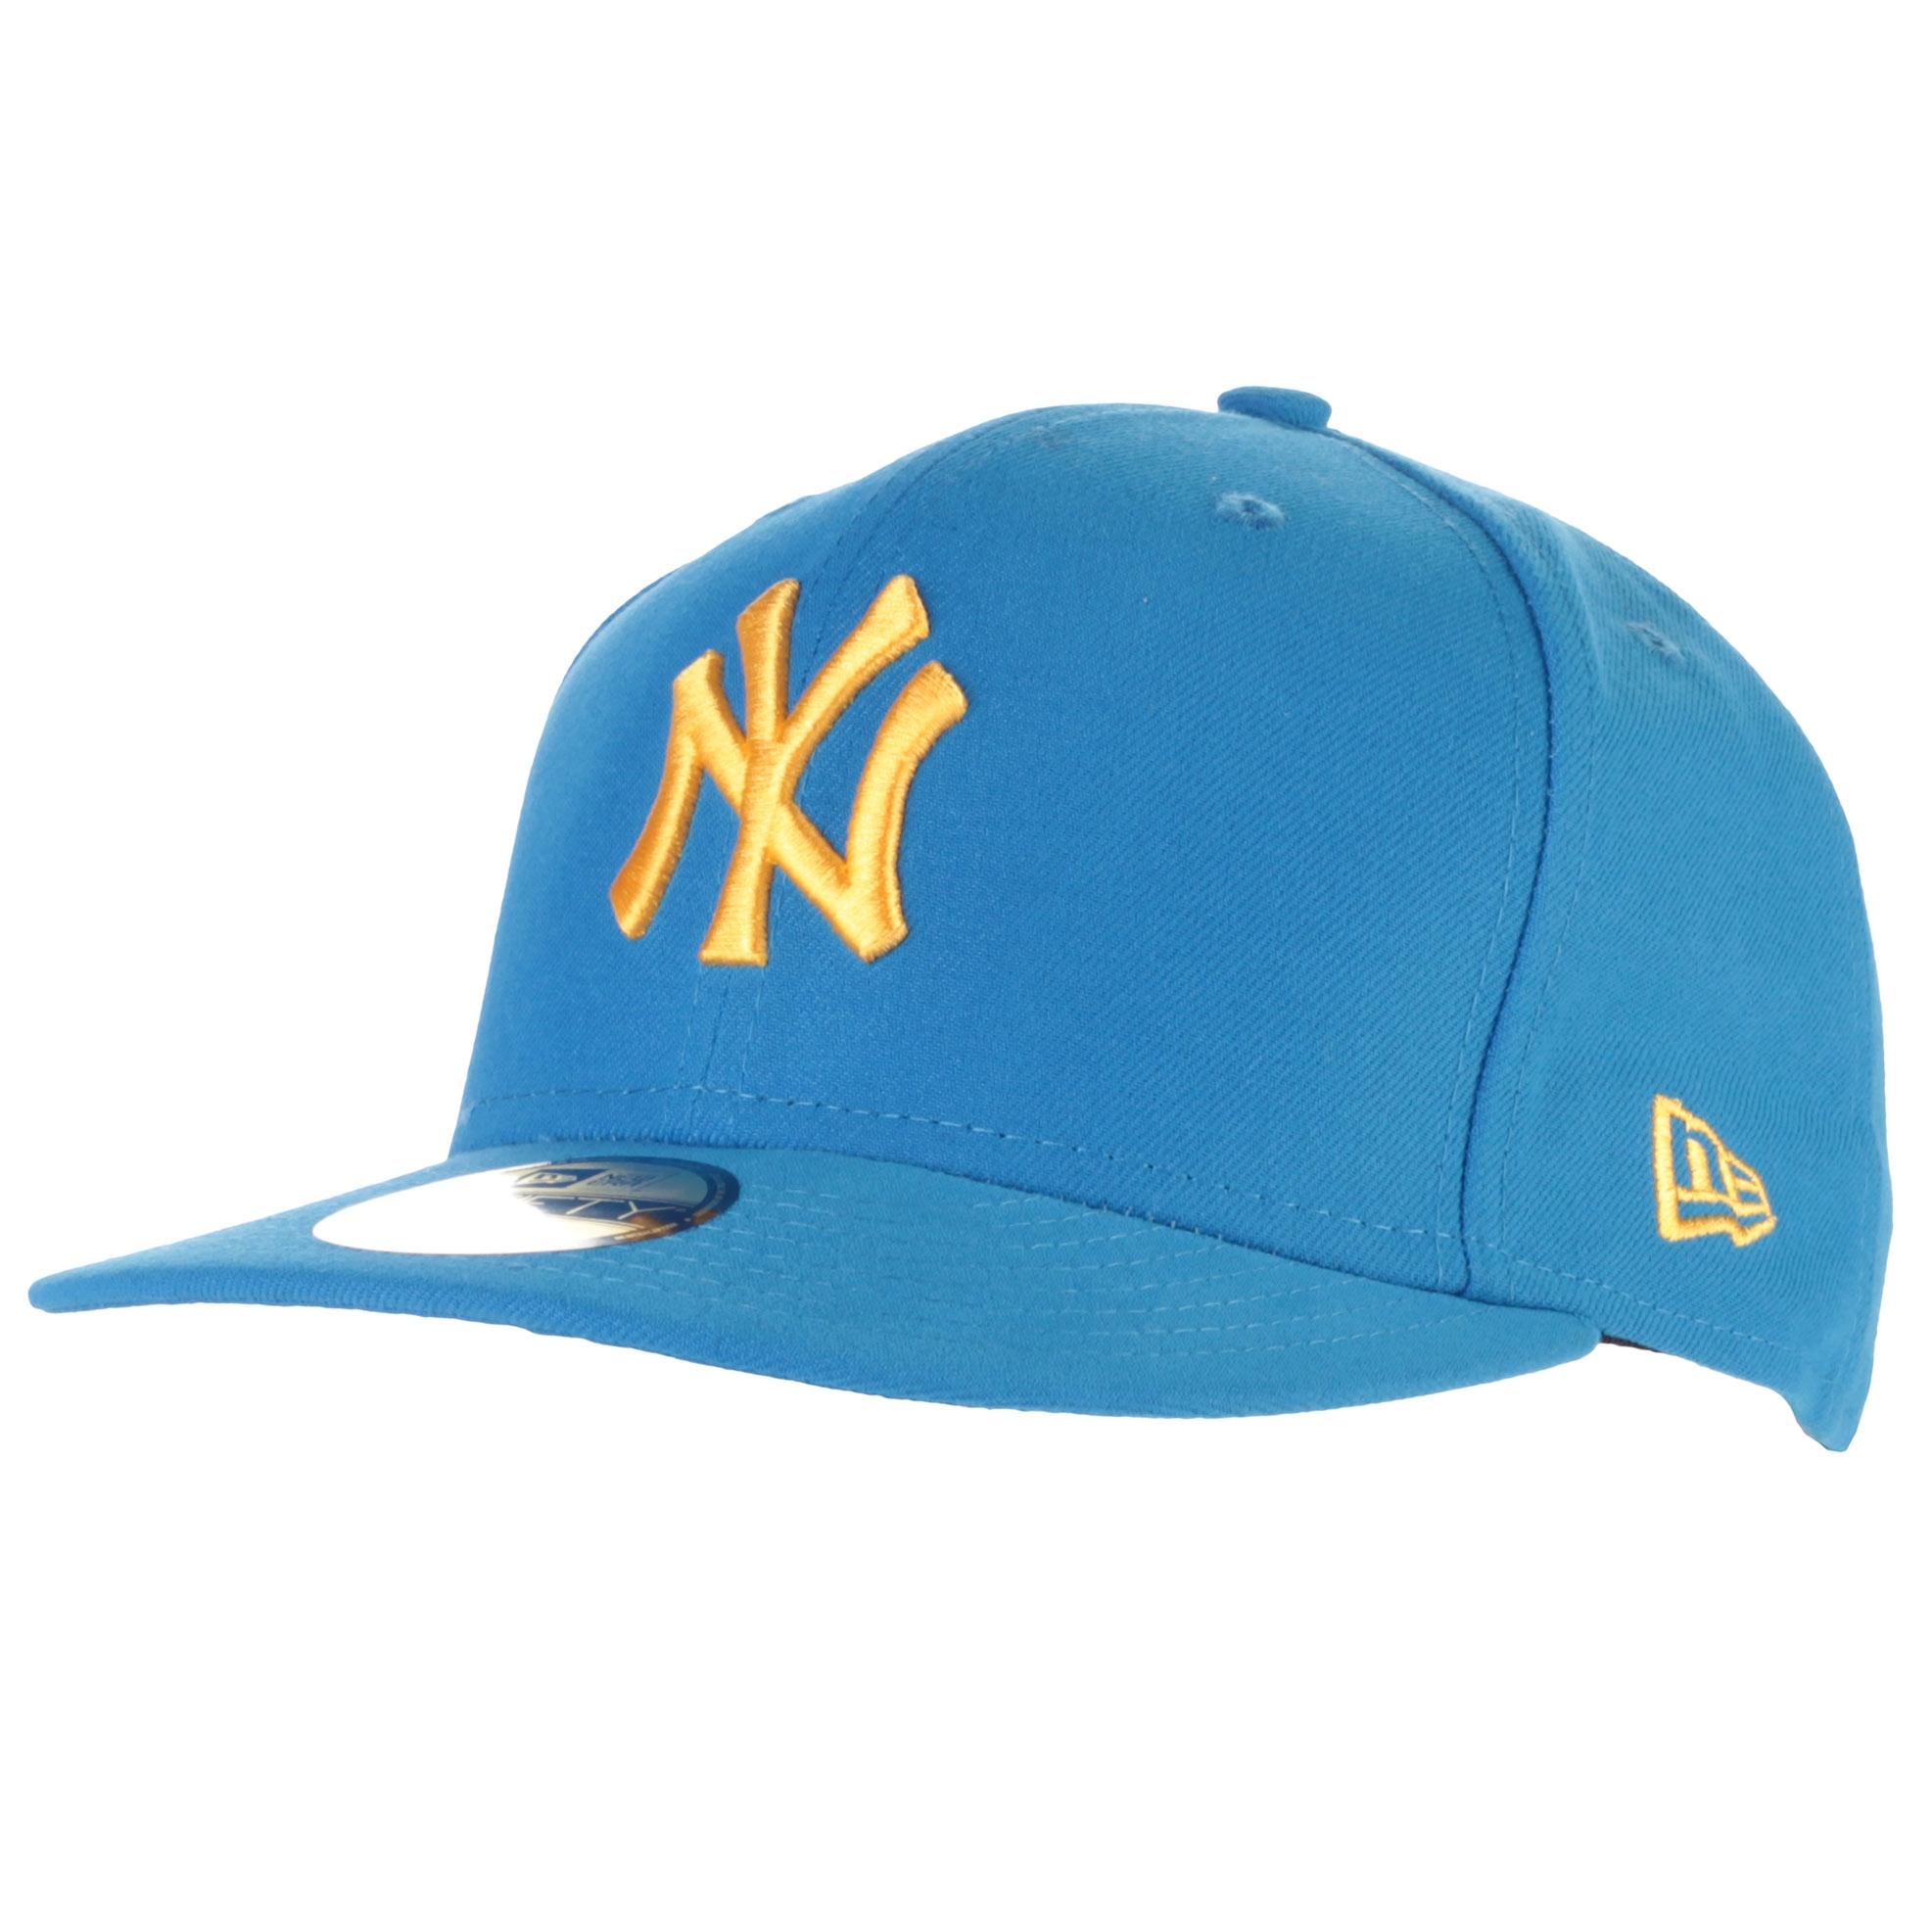 Kšiltovka New Era New York Yankees 59Fifty blue/gold